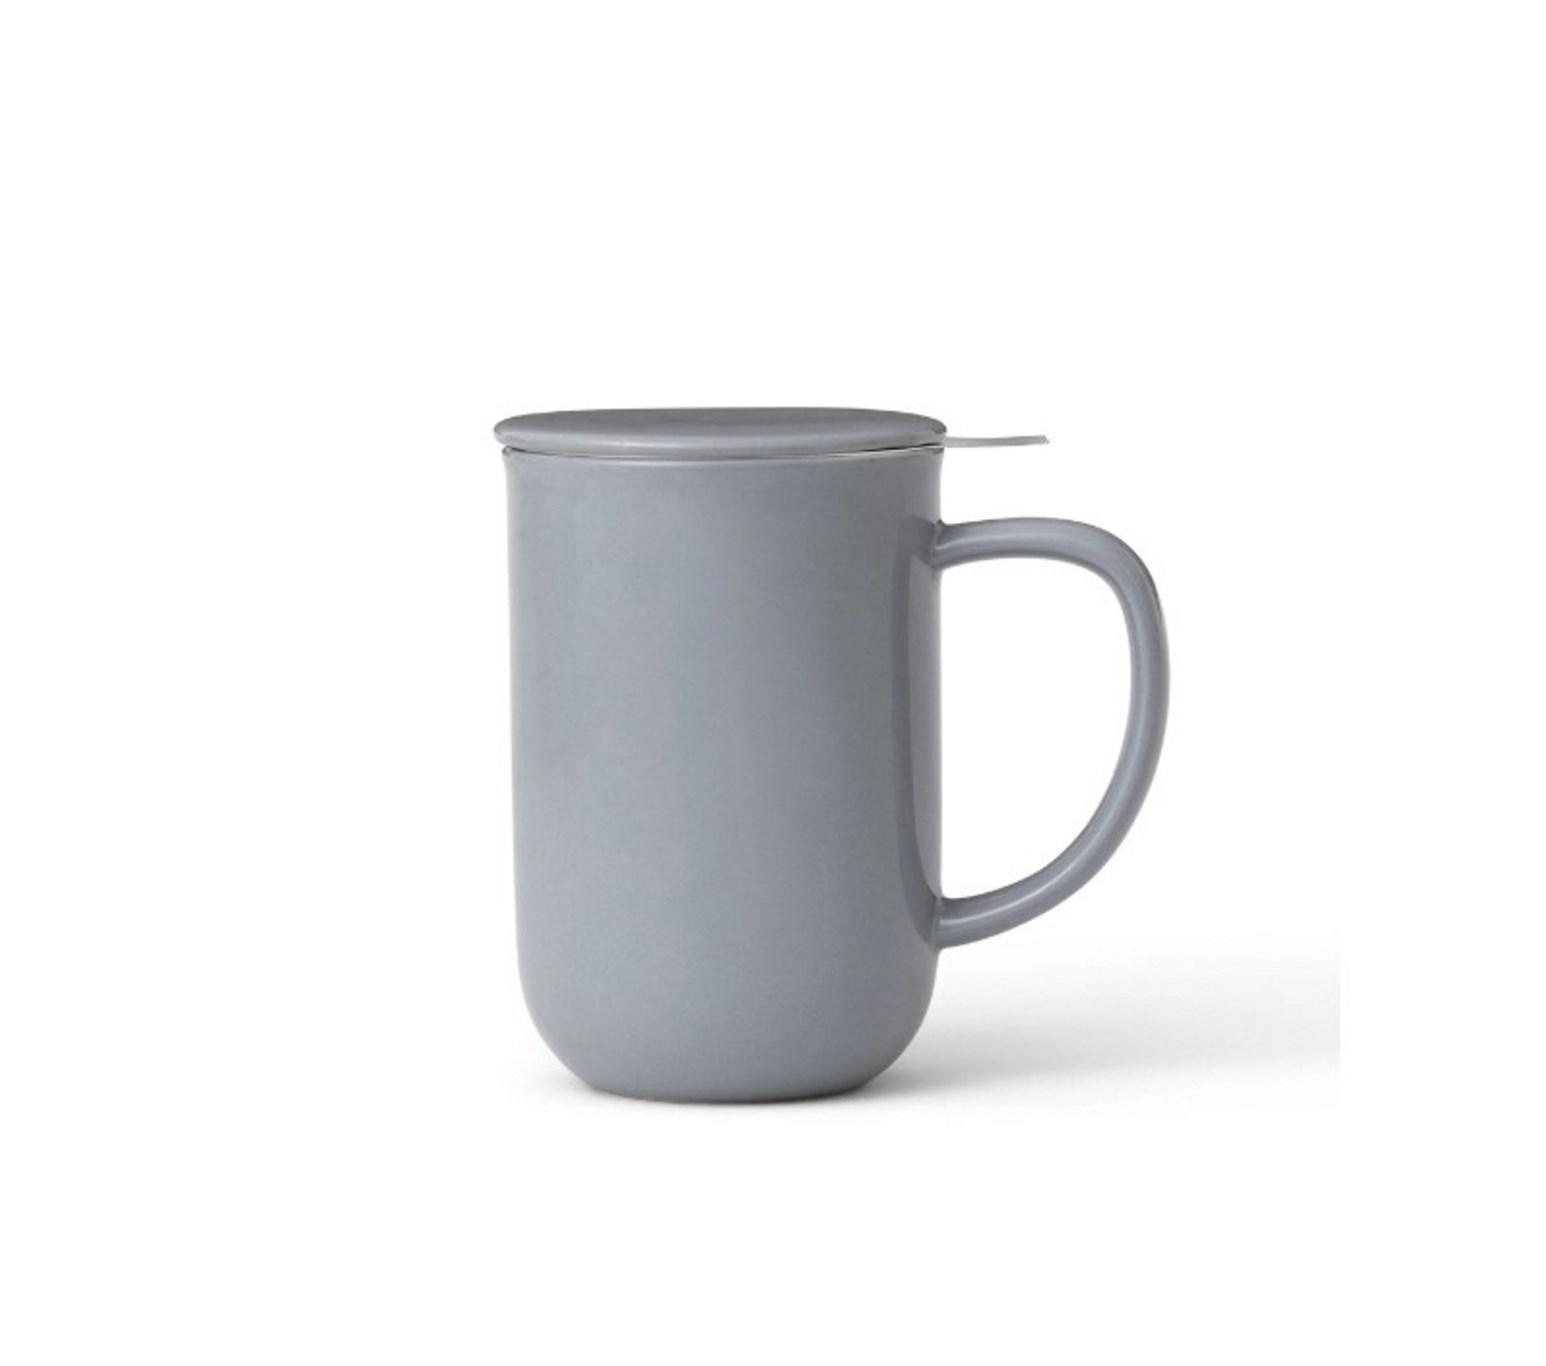 Онлайн каталог PROMENU: Кружка для чая с ситечком Viva Scandinavia MINIMA Sea salt, объем 0,55 л, светло-серый                               V77554